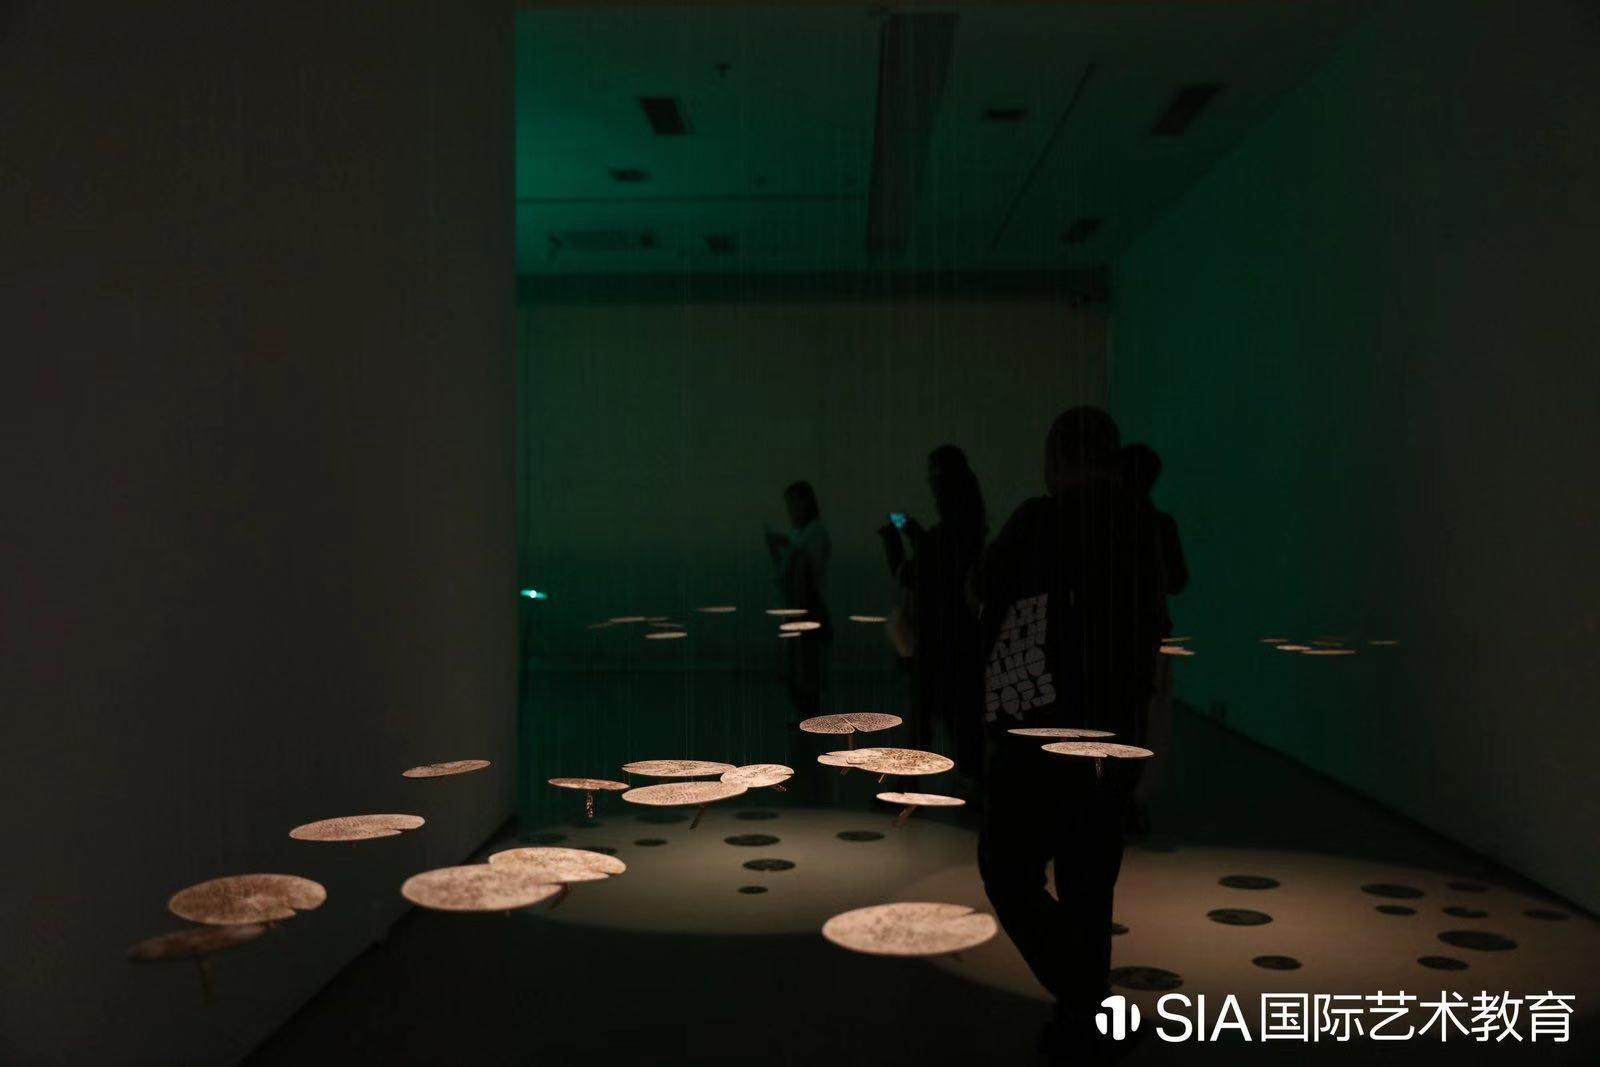 HERE THERE アートの未来:グローバルな新しいデザイン展_e0170406_10545629.jpg